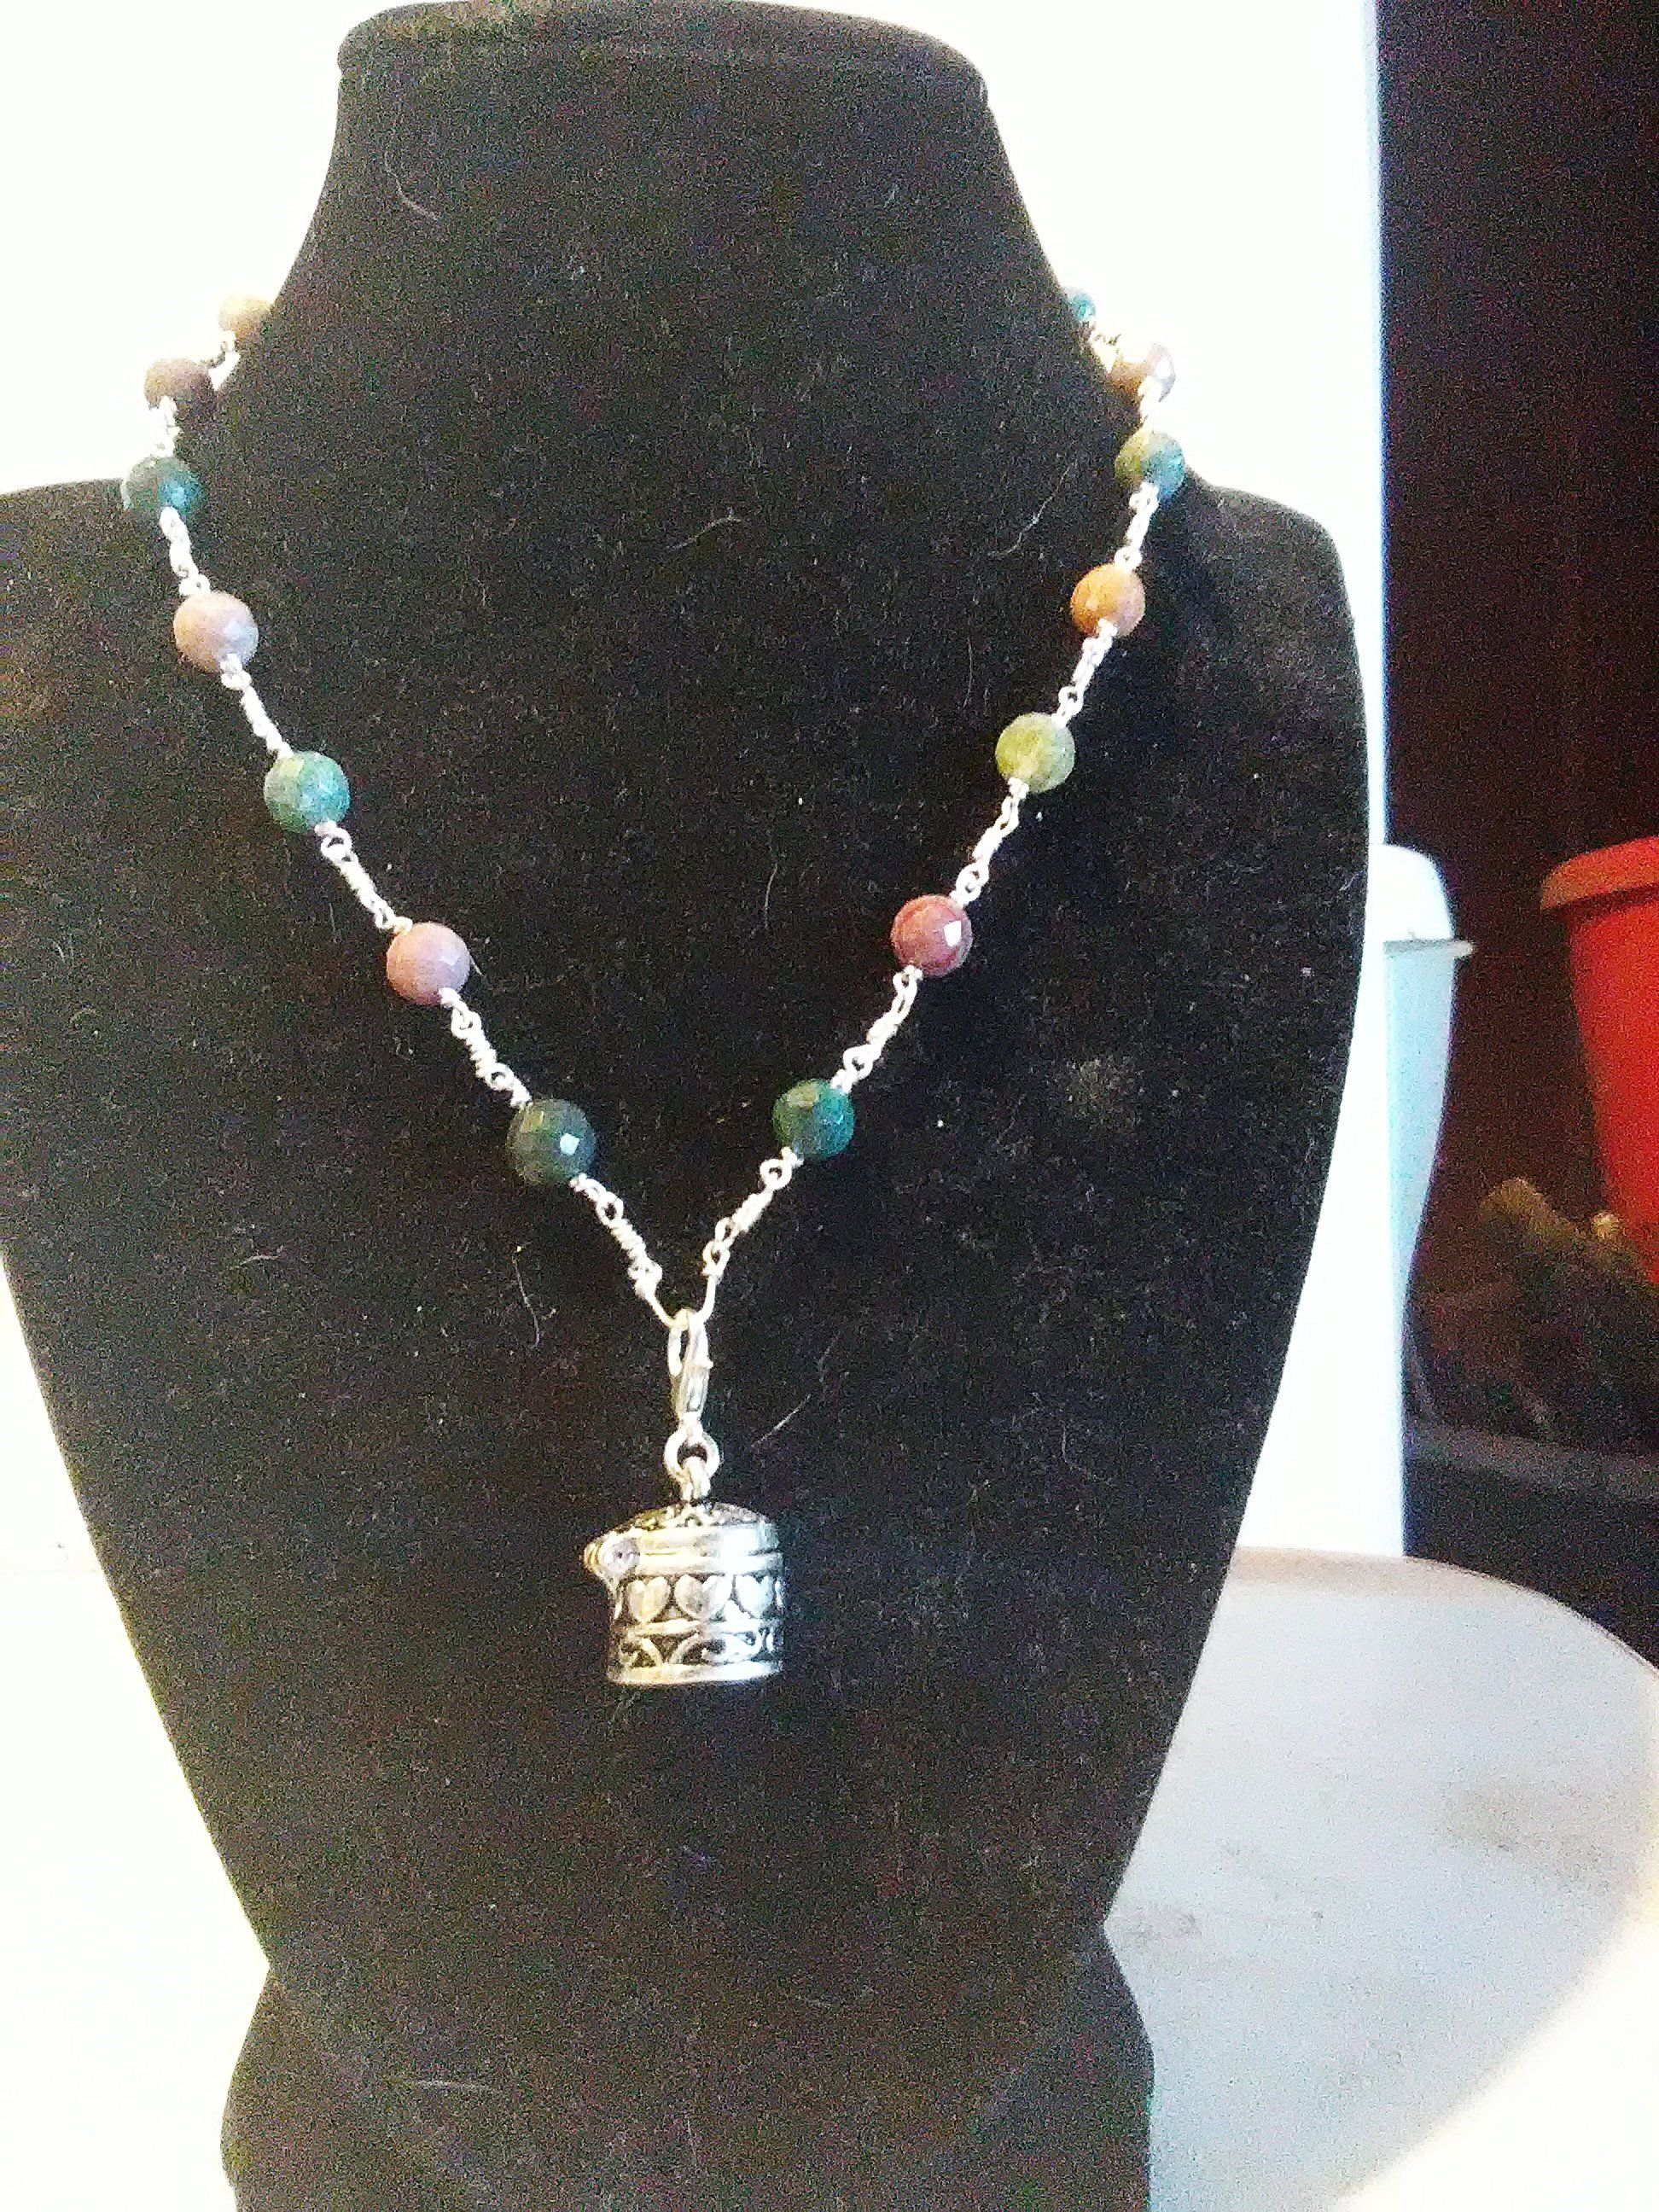 Faceted malaysian jade prayer box necklace choker